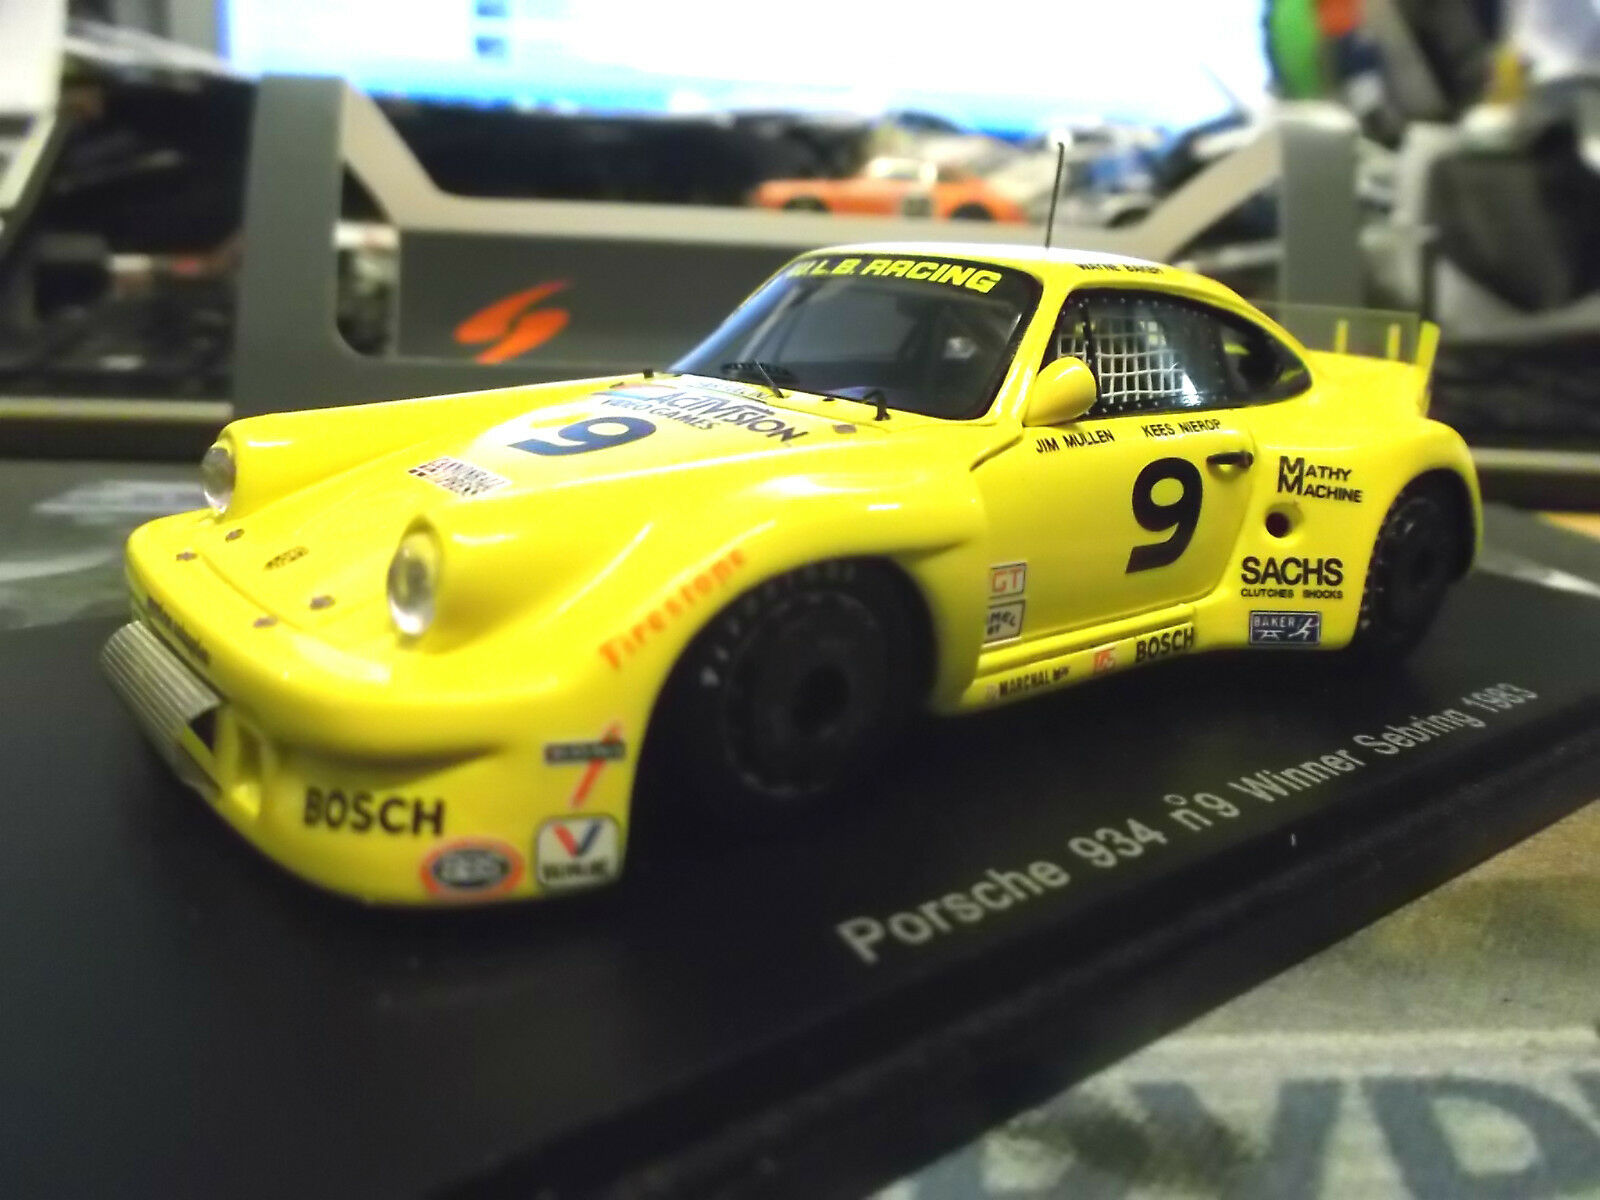 PORSCHE 911 934 Carrera Winner sebring 1983  9 Baker Baker Baker Nierop WLB Spark Res 1 43  | Outlet Store  4ea40a